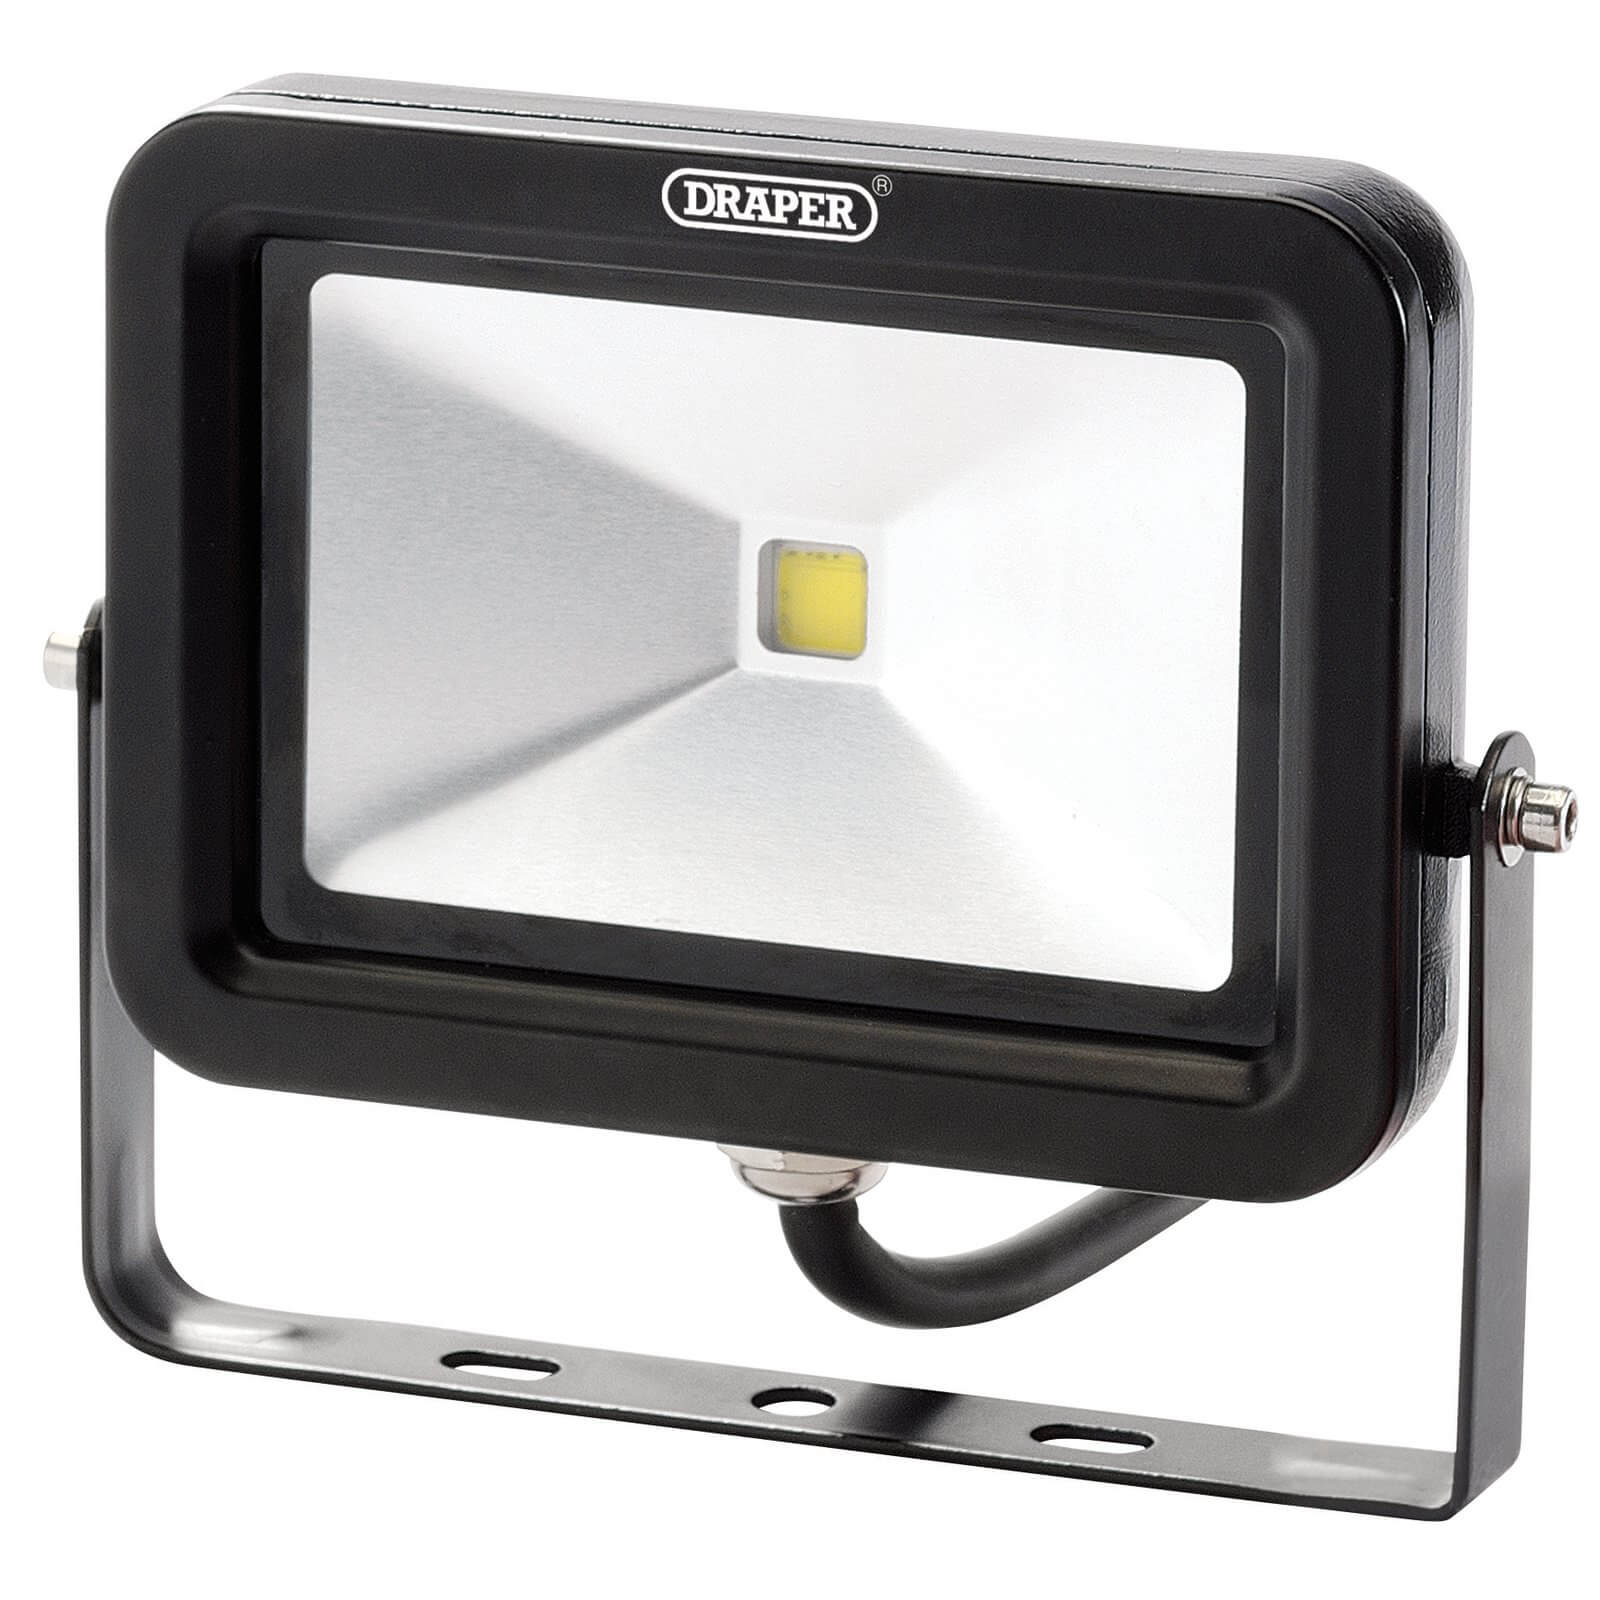 Image of Draper COB LED Slimeline Wall Mounted Floodlight 10 Watts